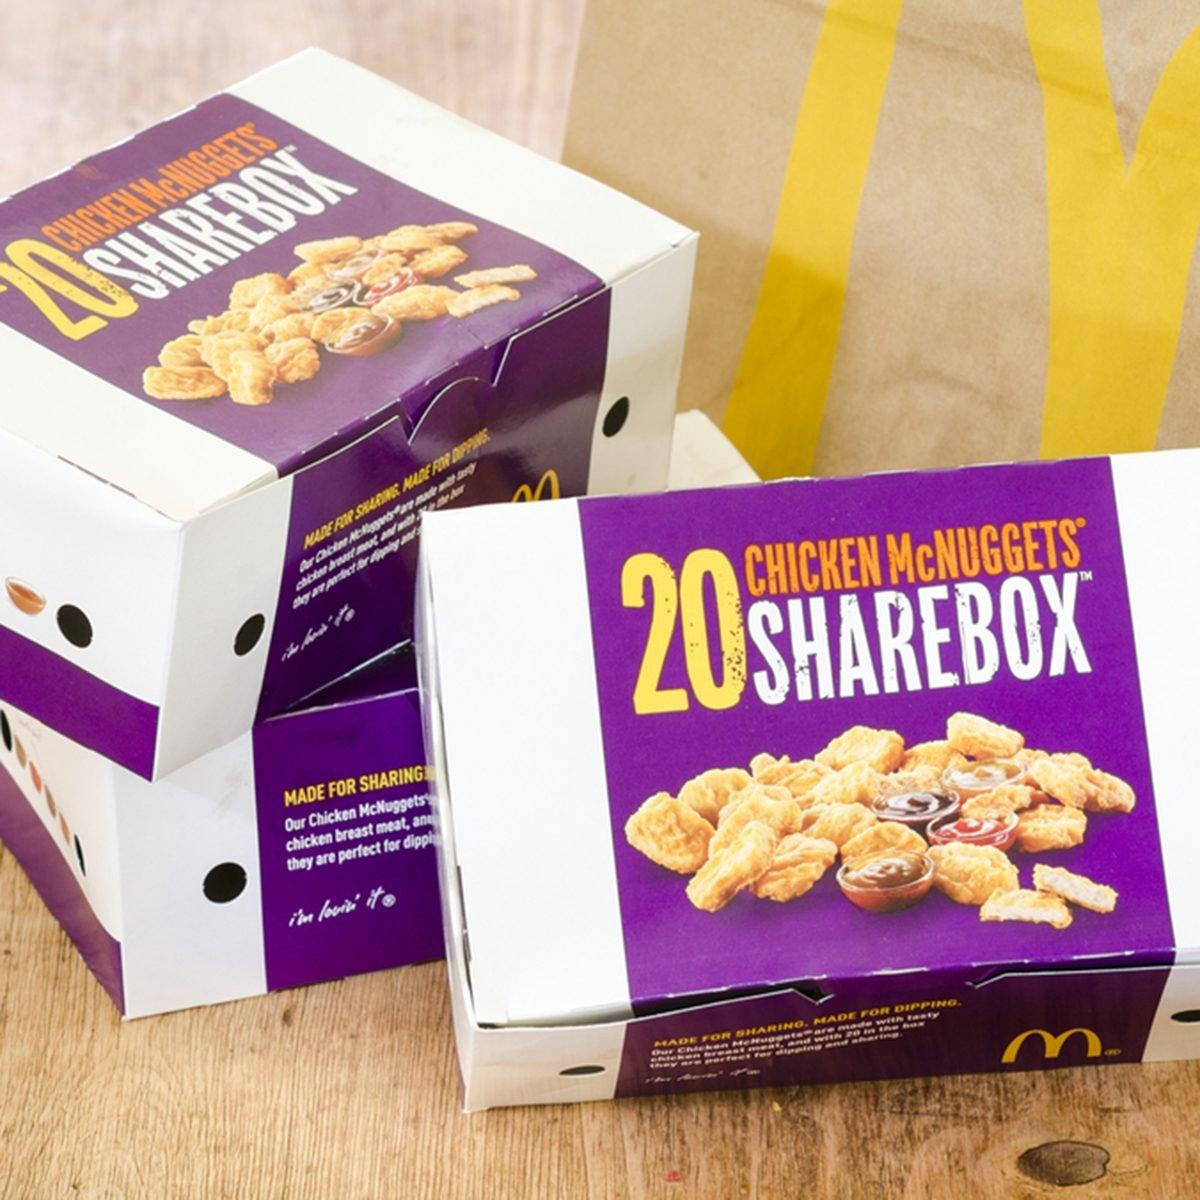 Box of McDonald's Chicken McNuggets